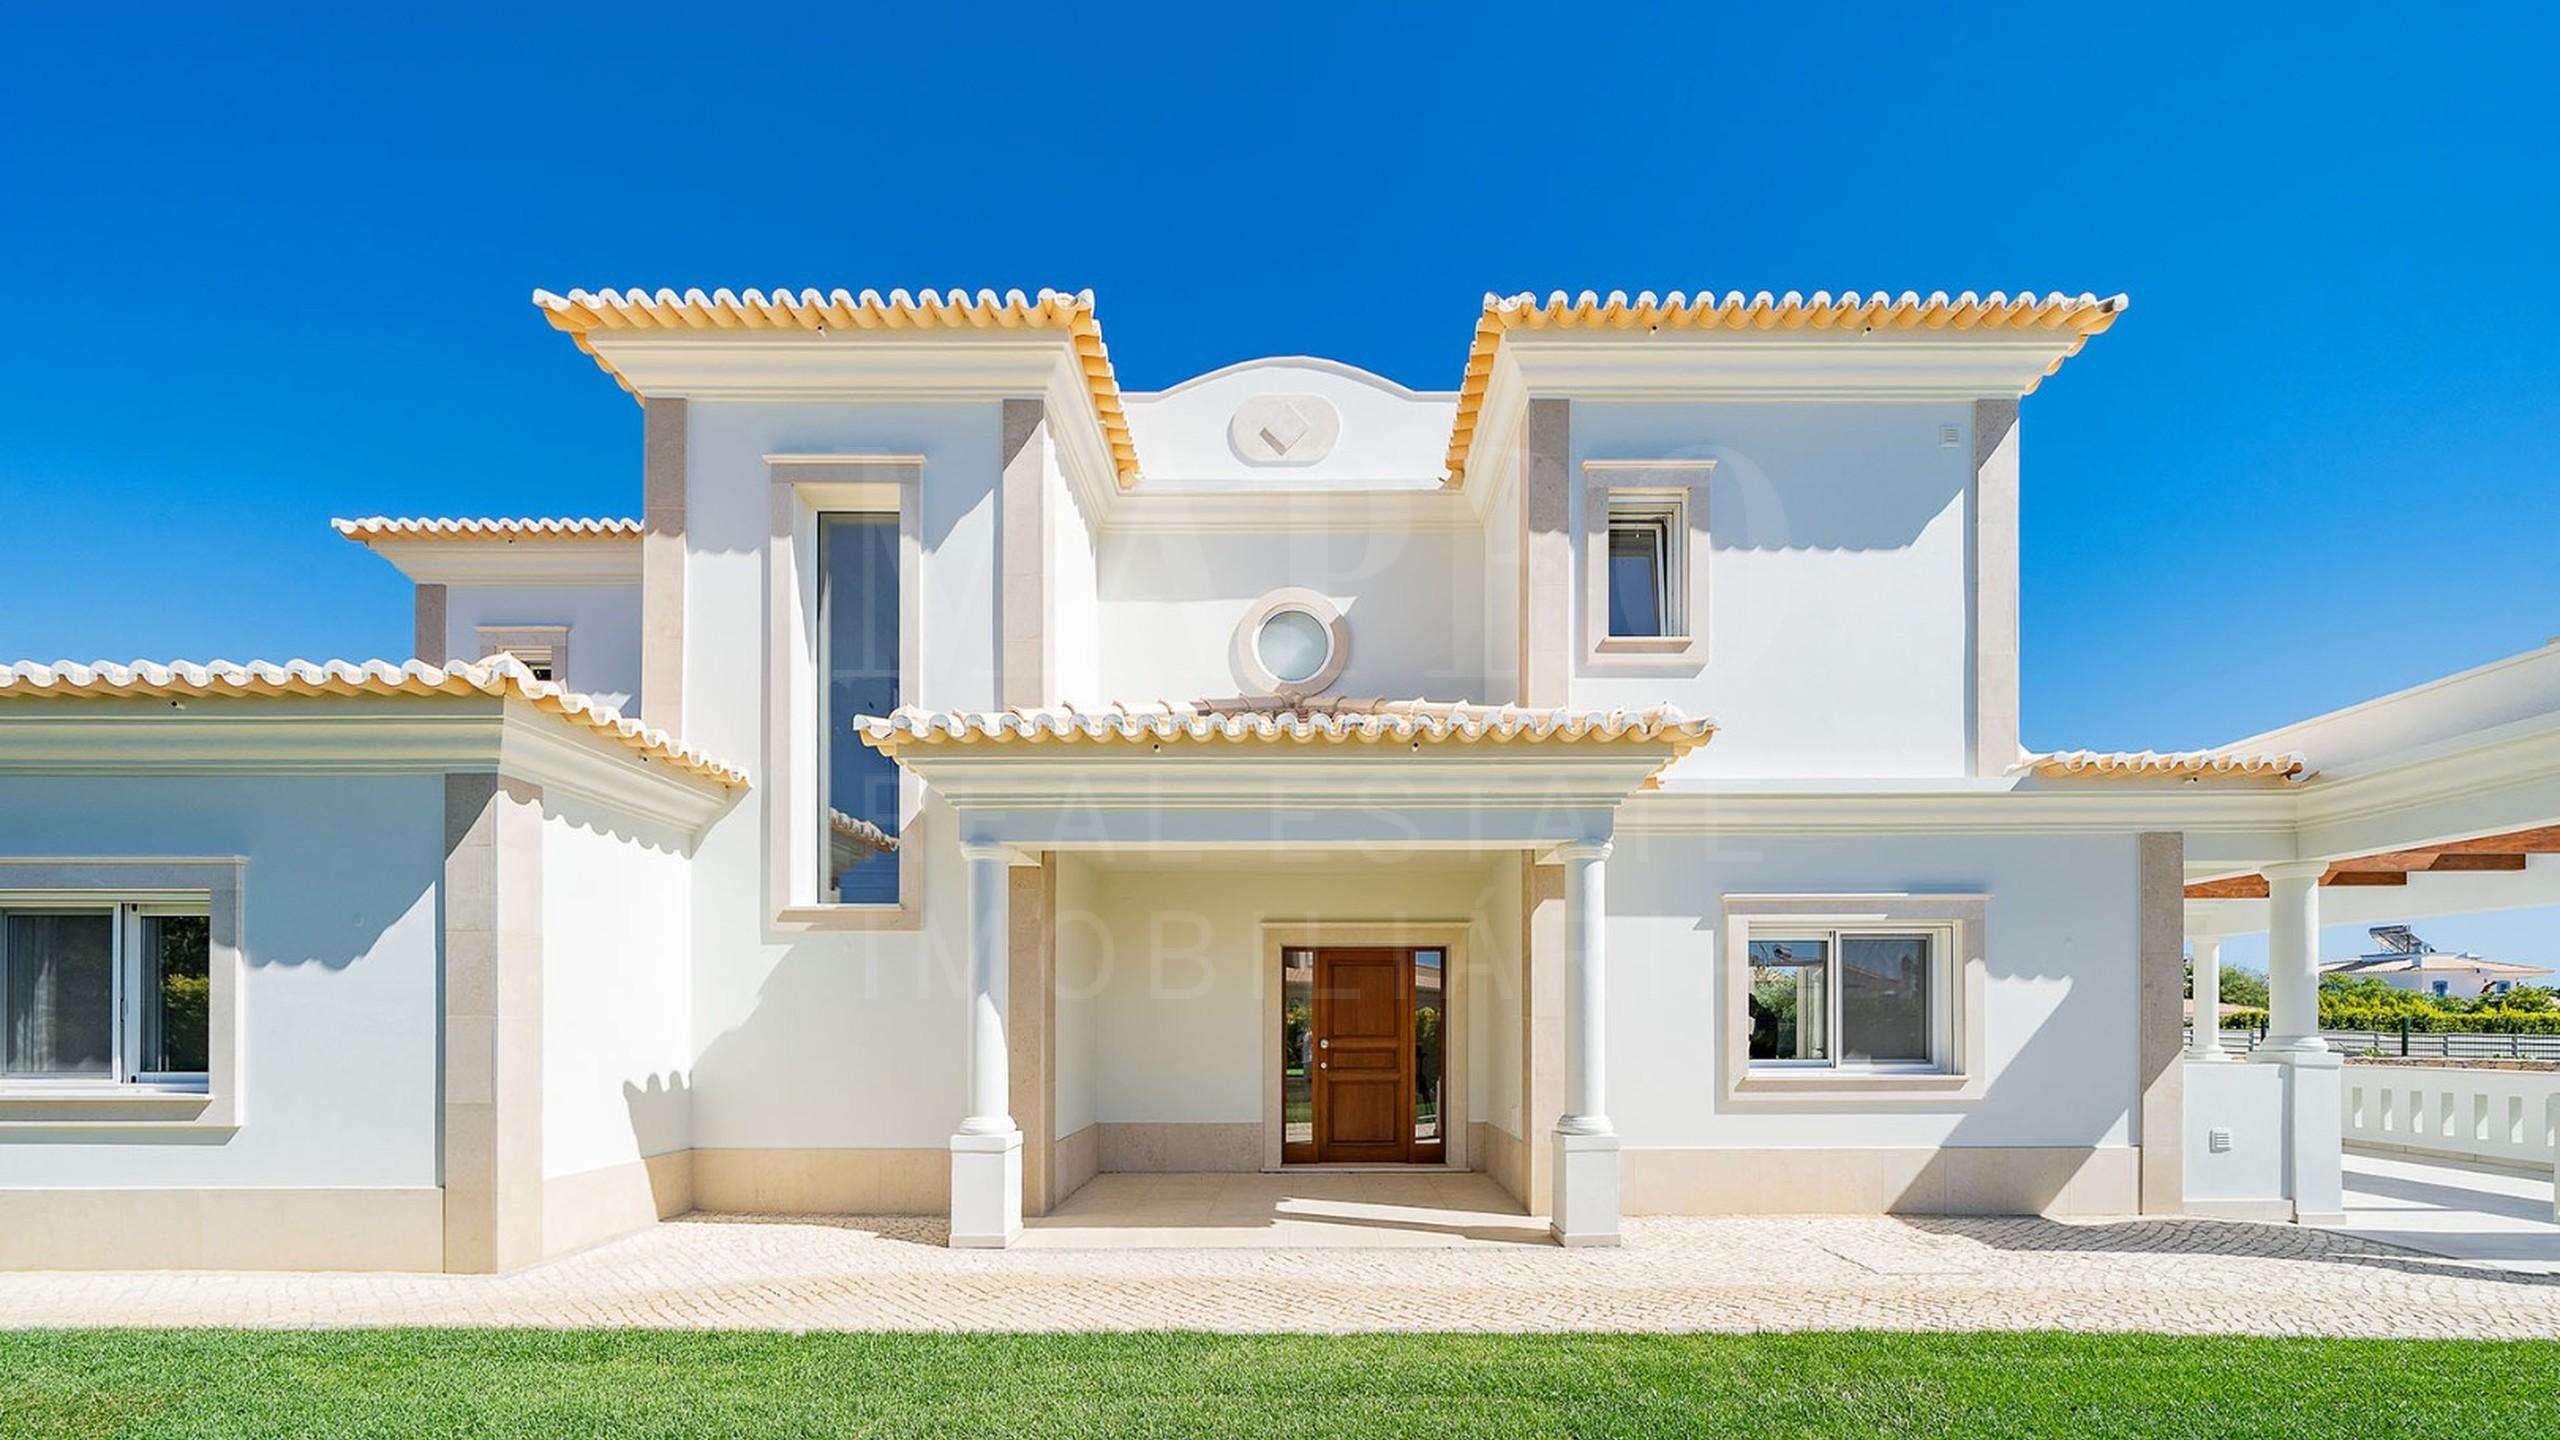 Vue de face de la villa de 4 chambres située dans le complexe de golf de Vila Sol